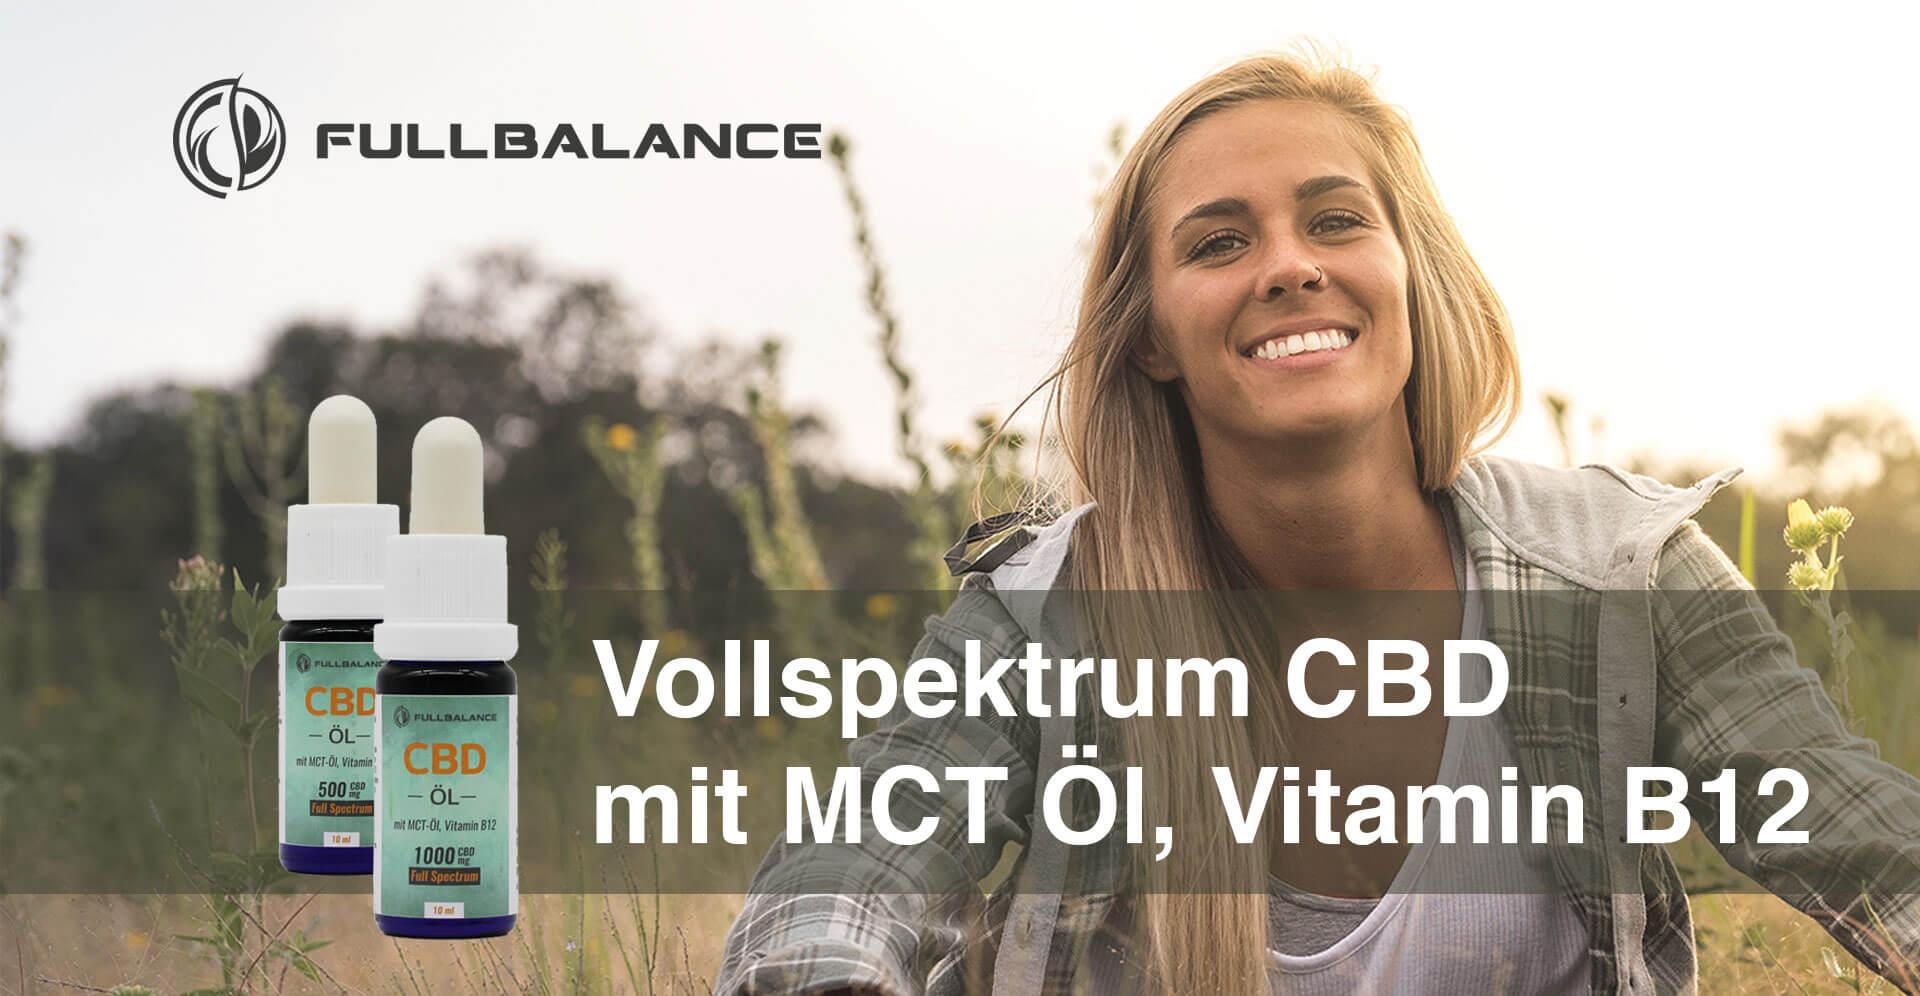 Vollspektrum CBD Öl - Full Balance